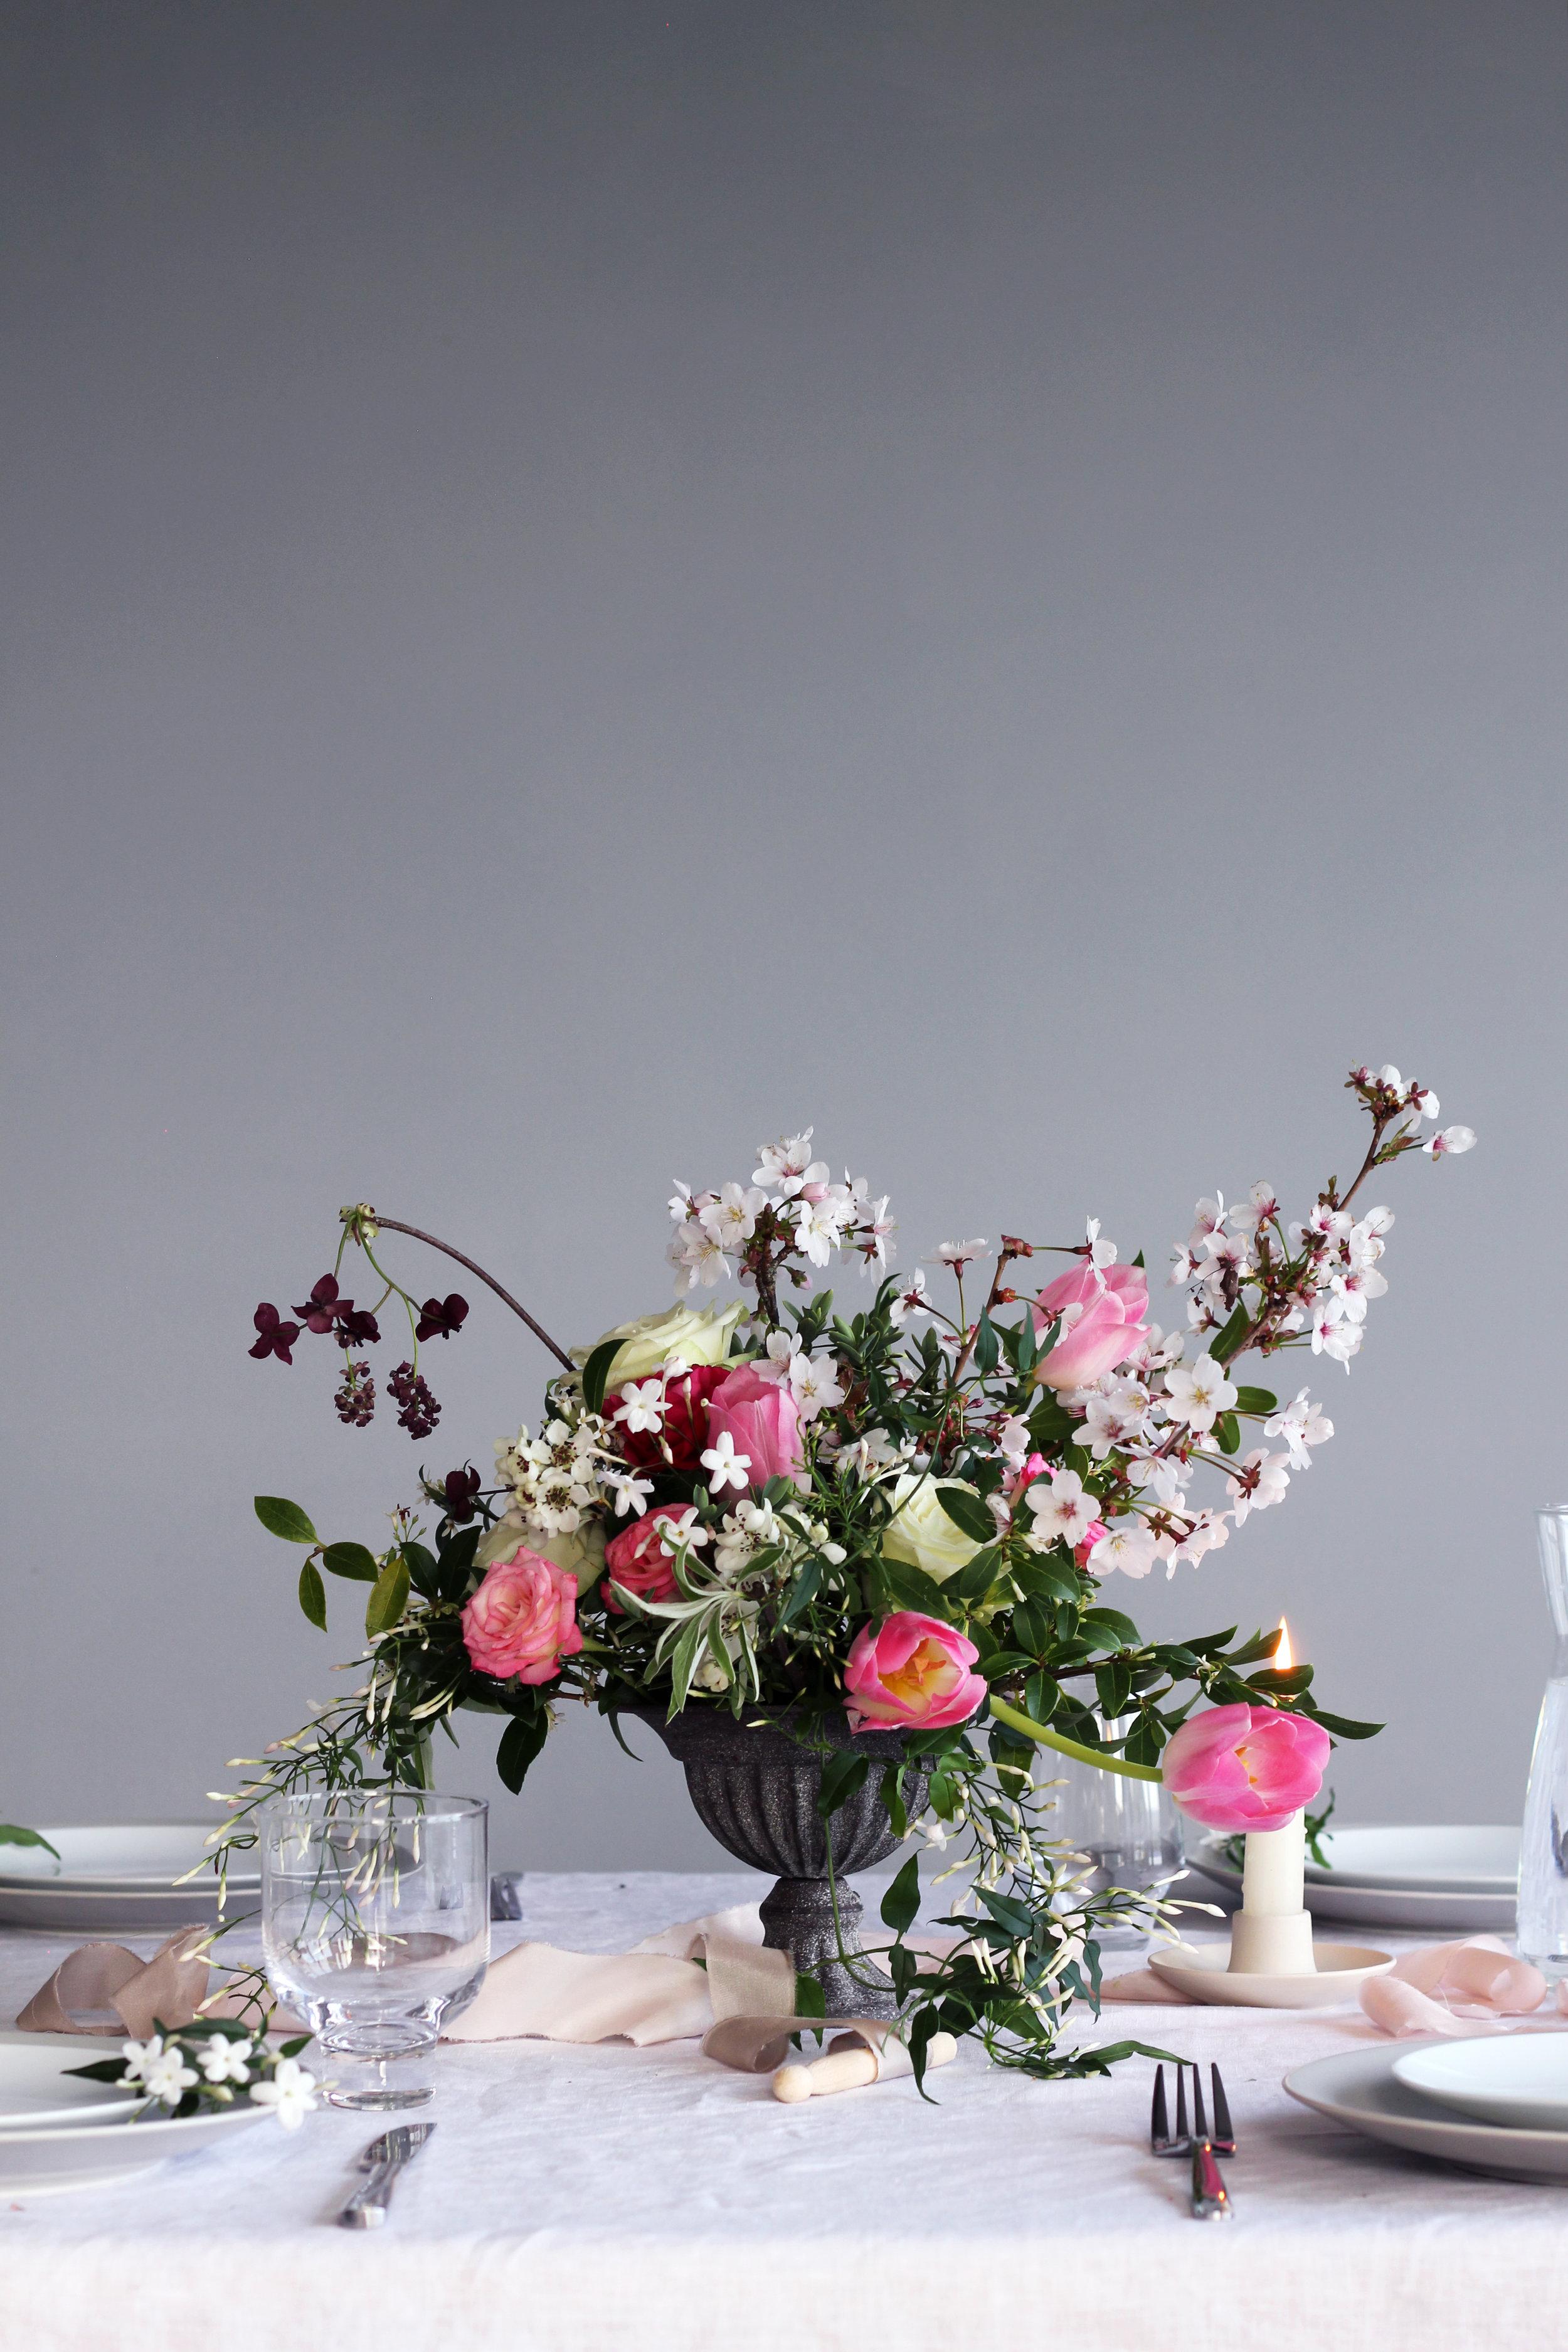 Callie-Pettigrew-Springtime-Wedding-15.jpg